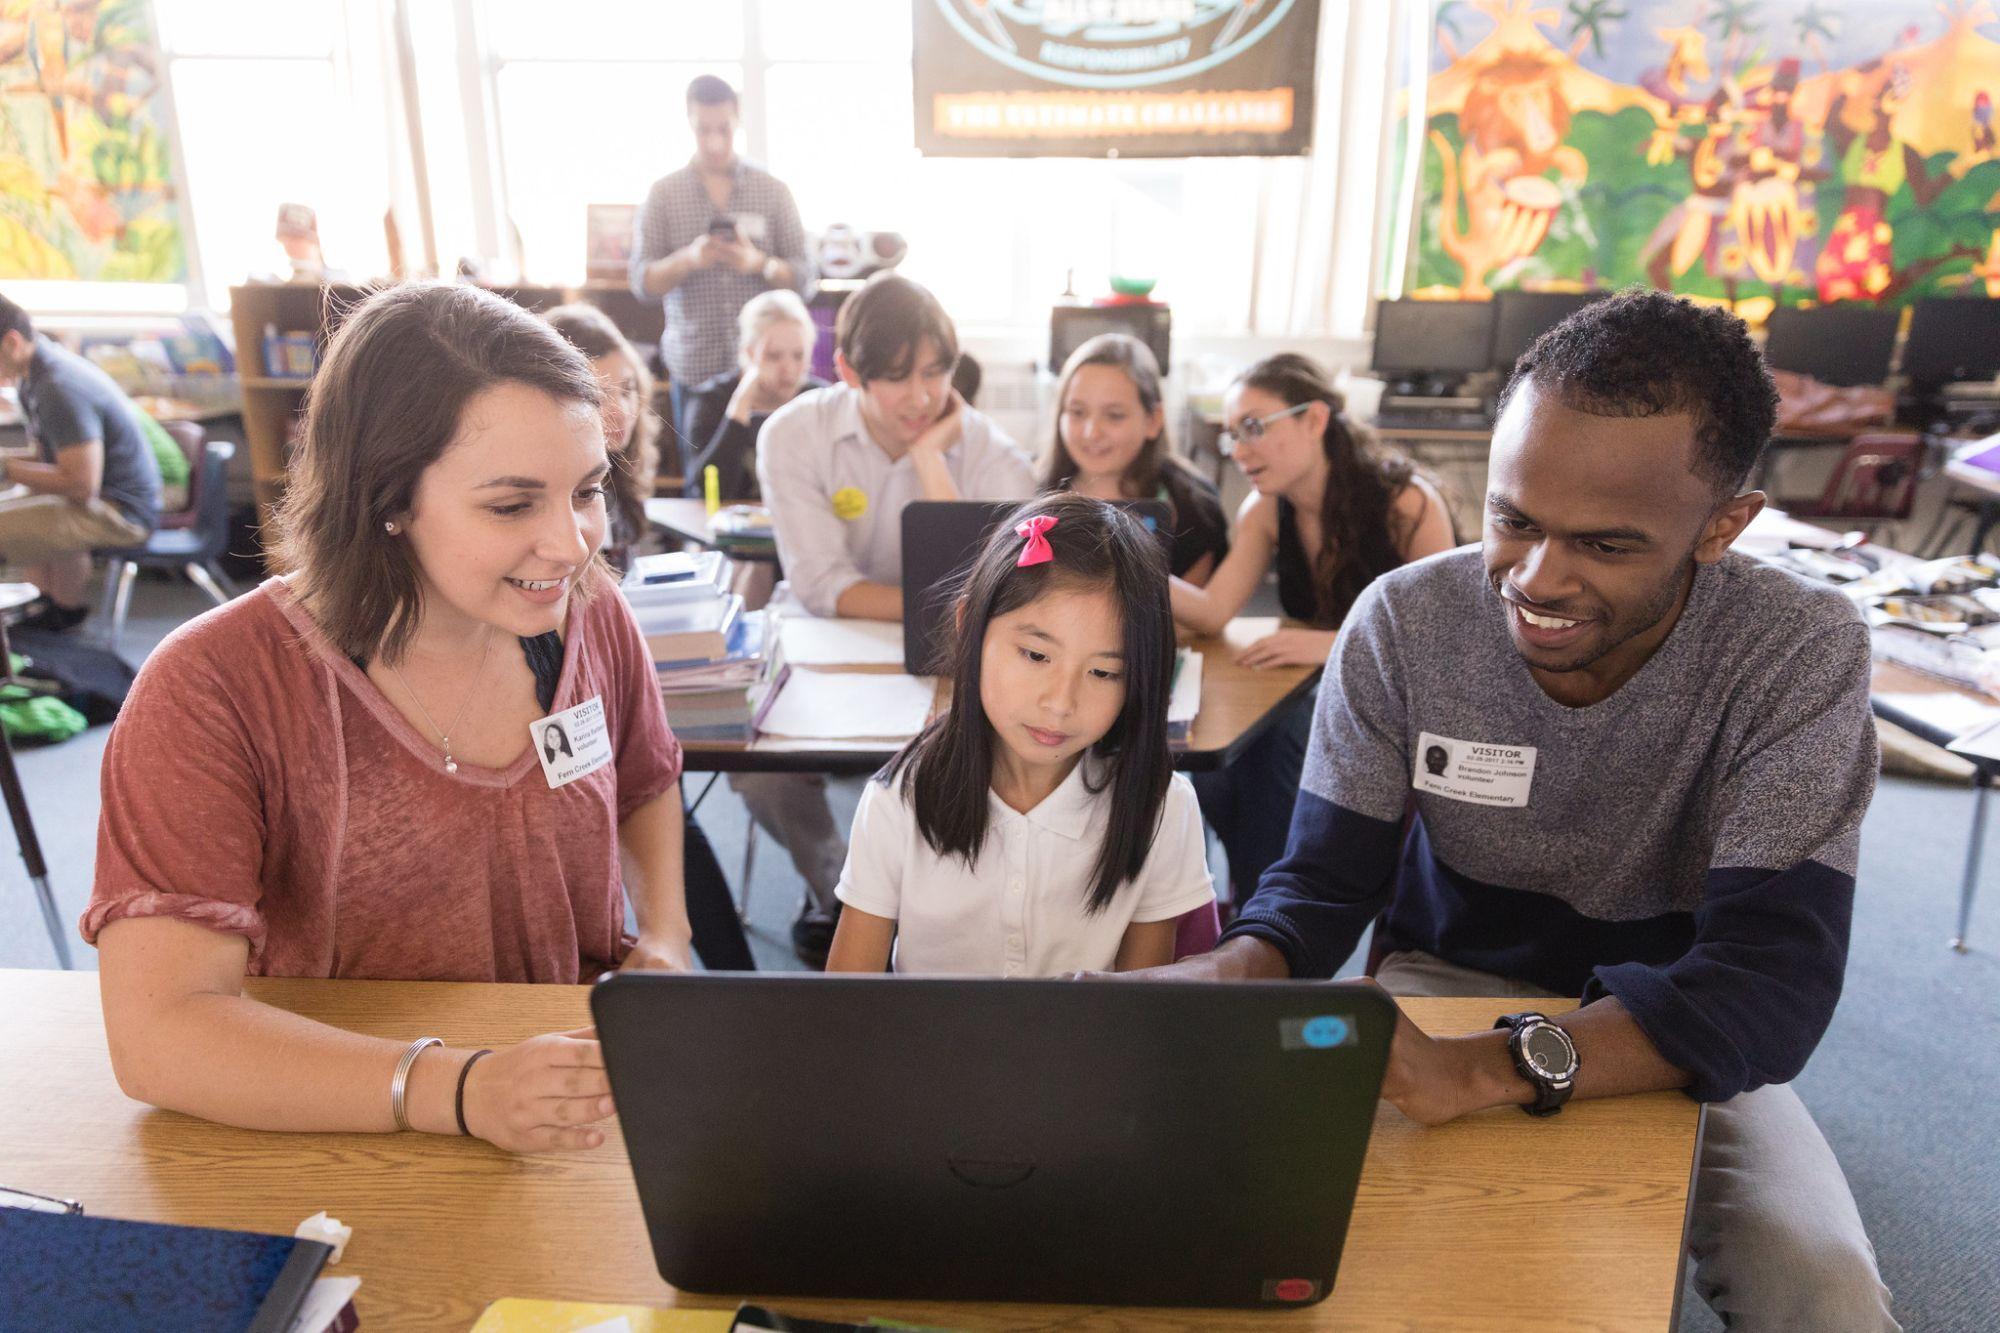 Karina Barbesino teaches the basics of coding to students at Fern Creek Elementary.